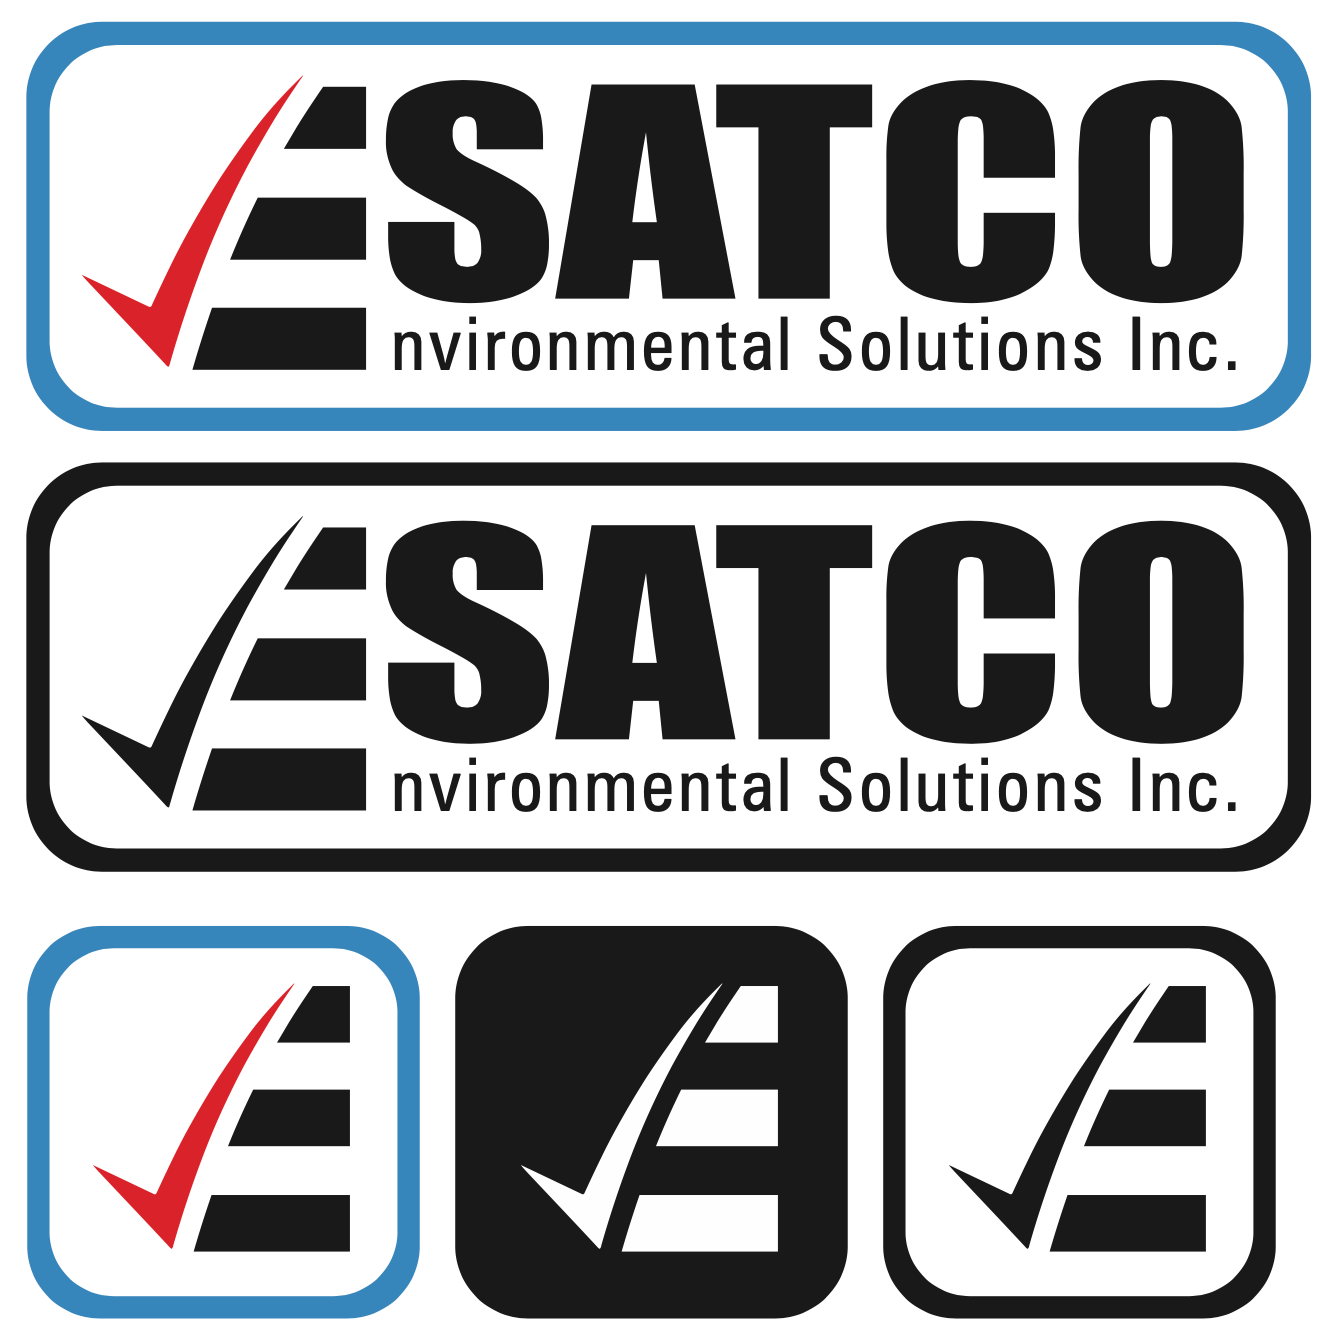 chemical engineer logo design